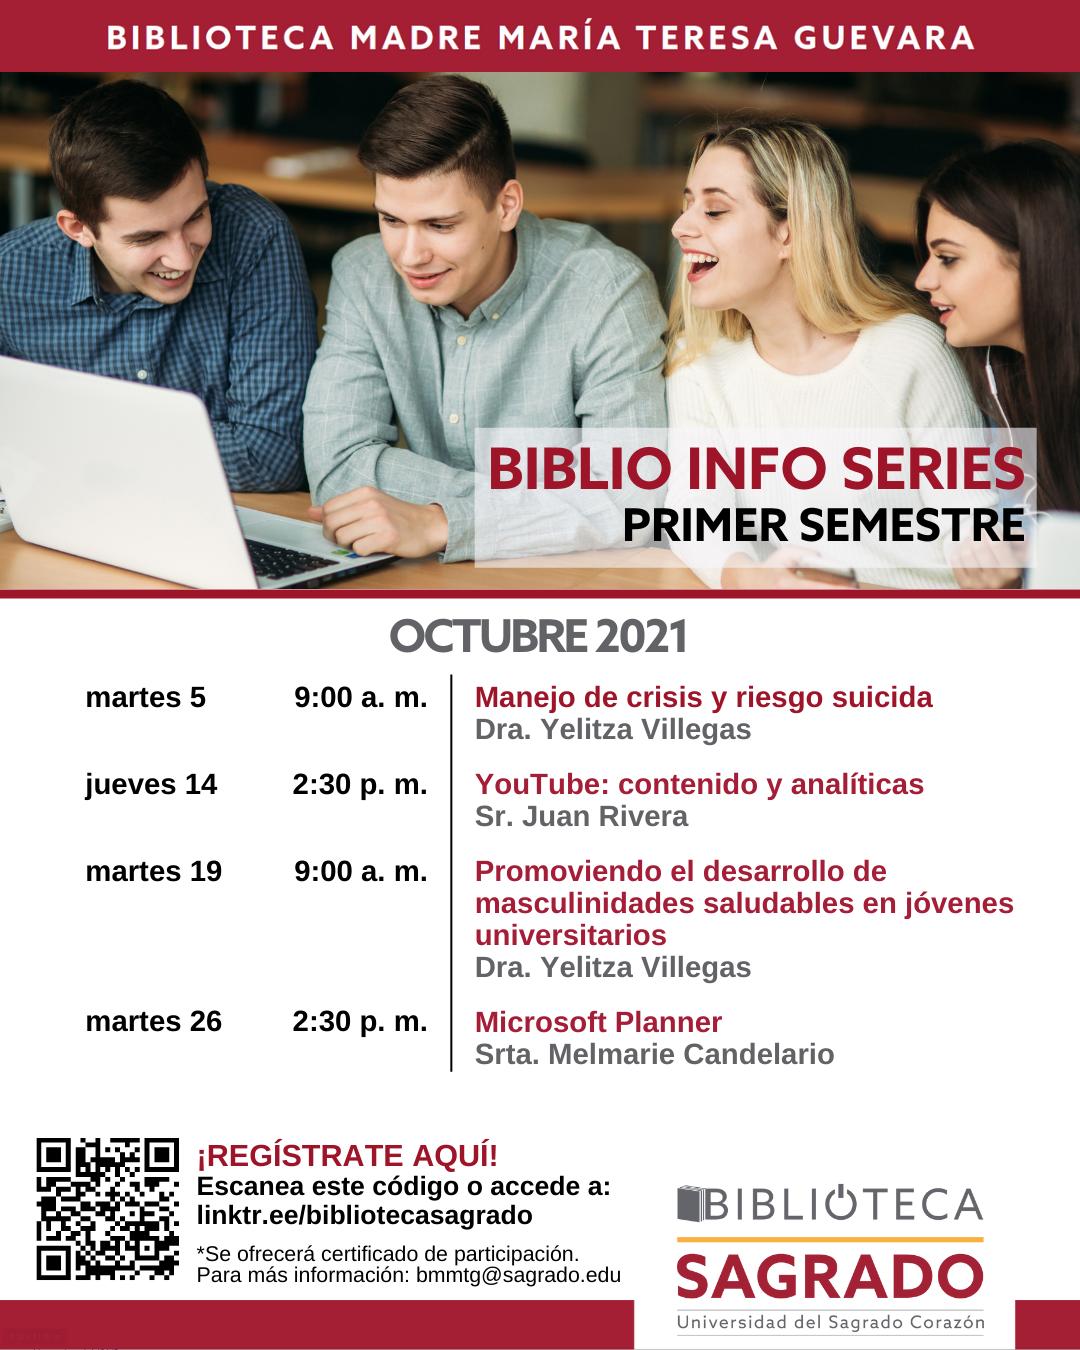 Afiche promocional de tallerers biblioteca para octubre 2021